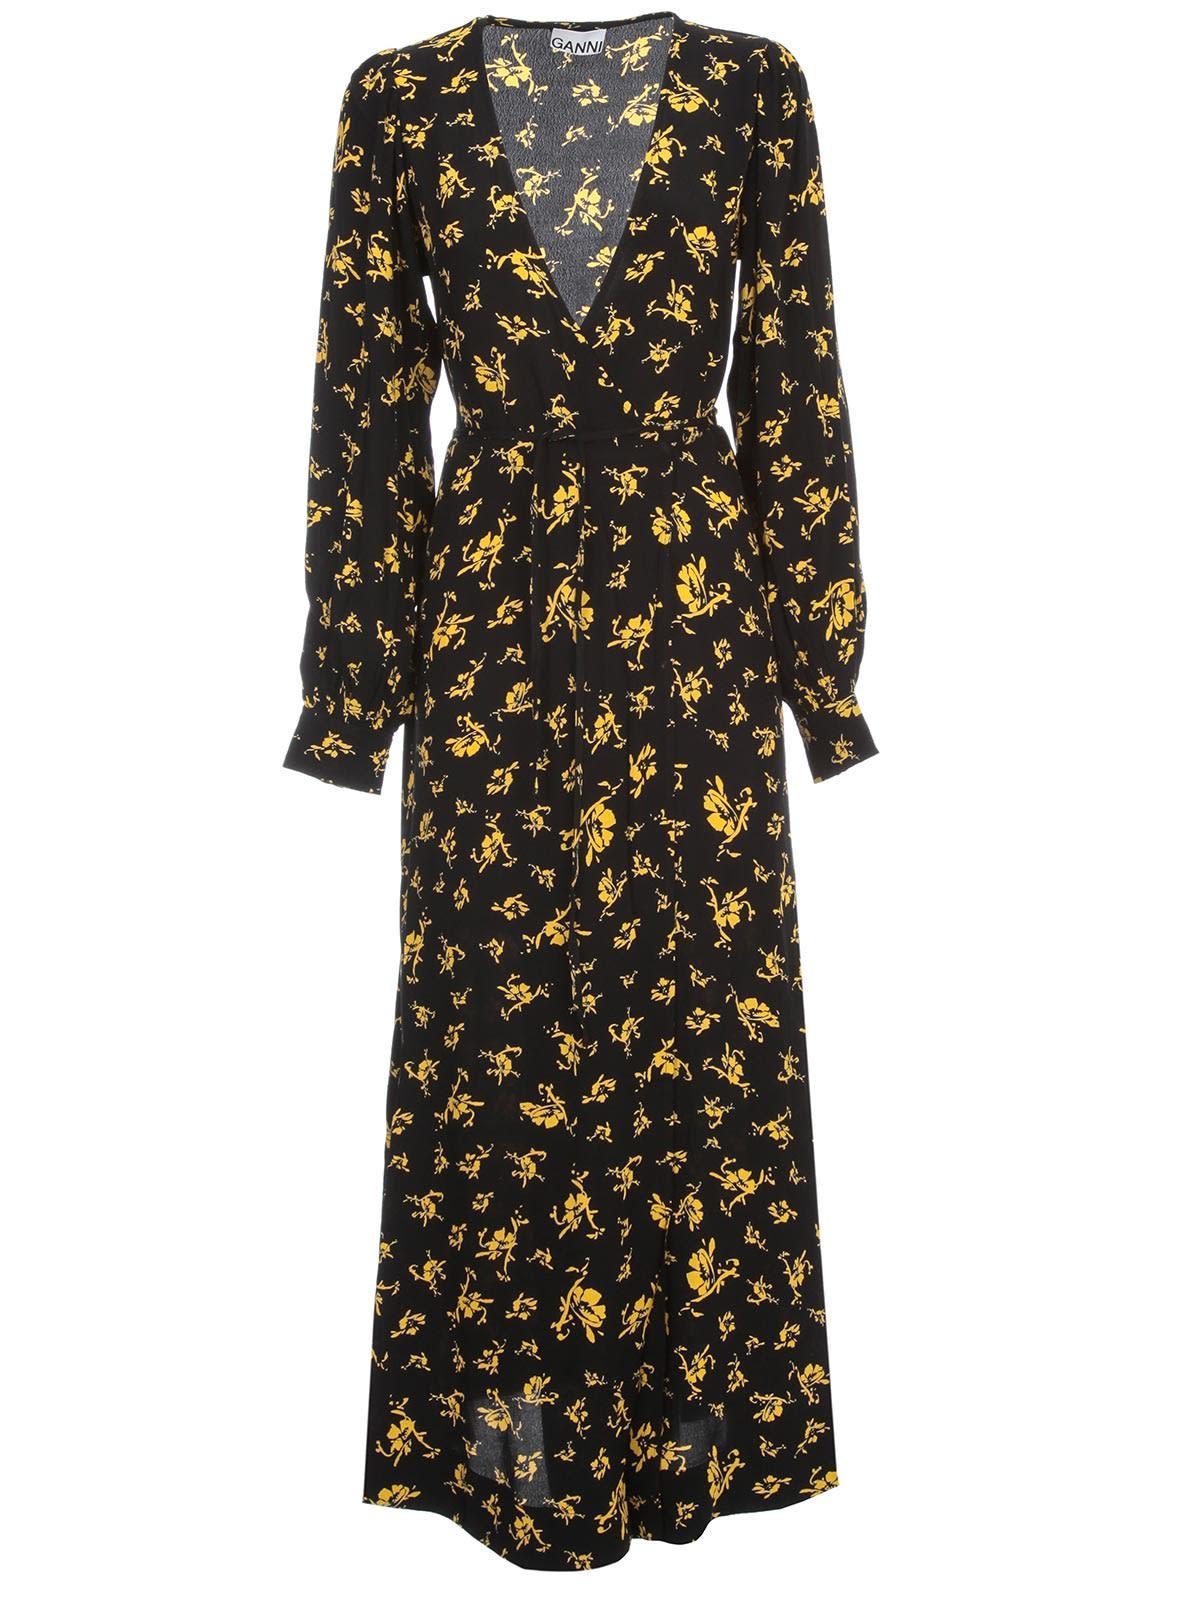 Buy Ganni Printed Crepe Dress L/s V Neck online, shop Ganni with free shipping